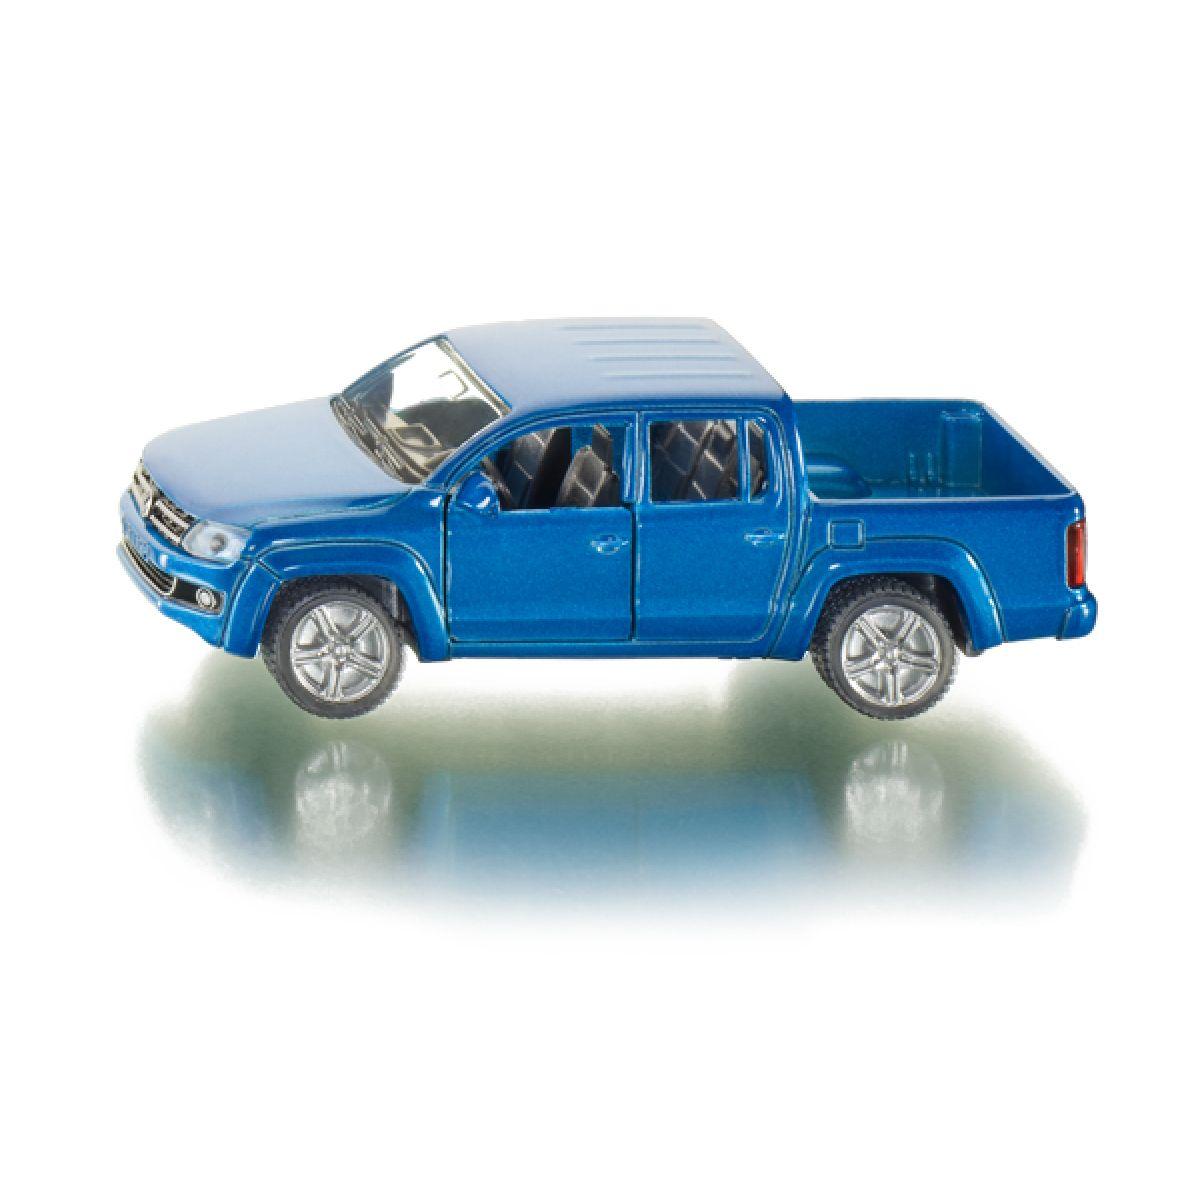 Siku 1443 Volkswagen Amarock